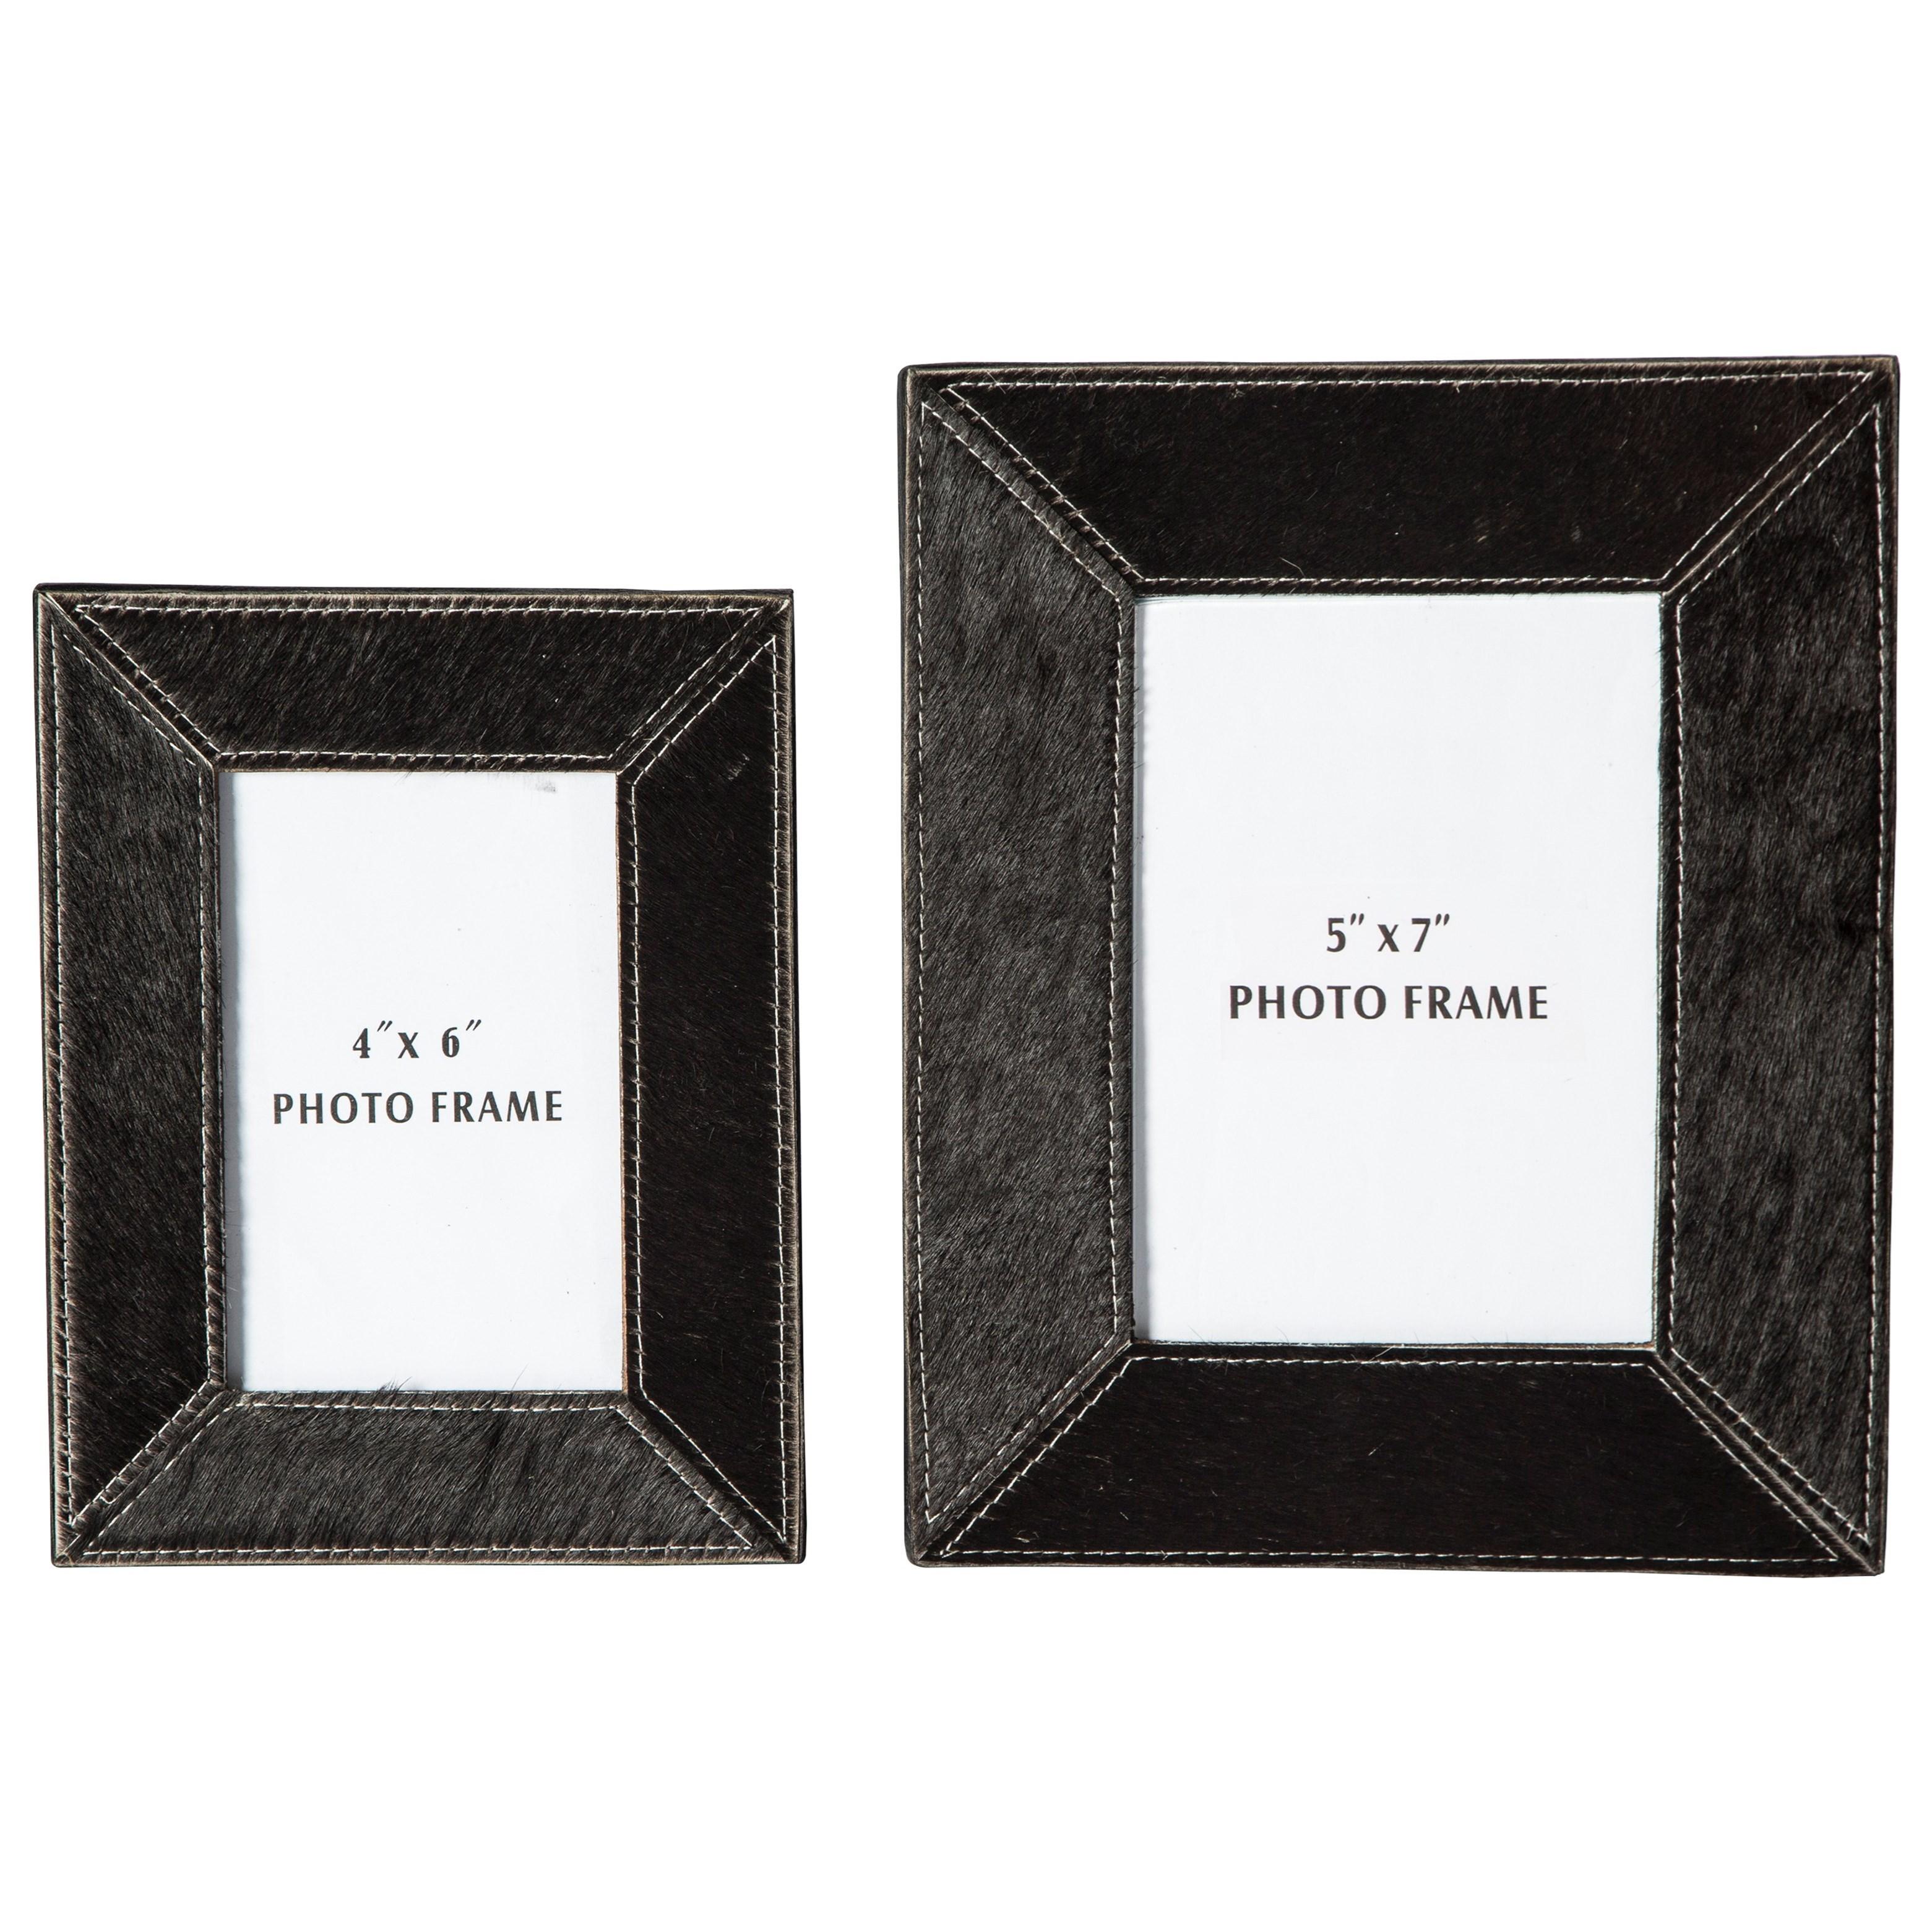 Accents Odeda Black Photo Frame (Set of 2) by Ashley Furniture Signature Design at Del Sol Furniture